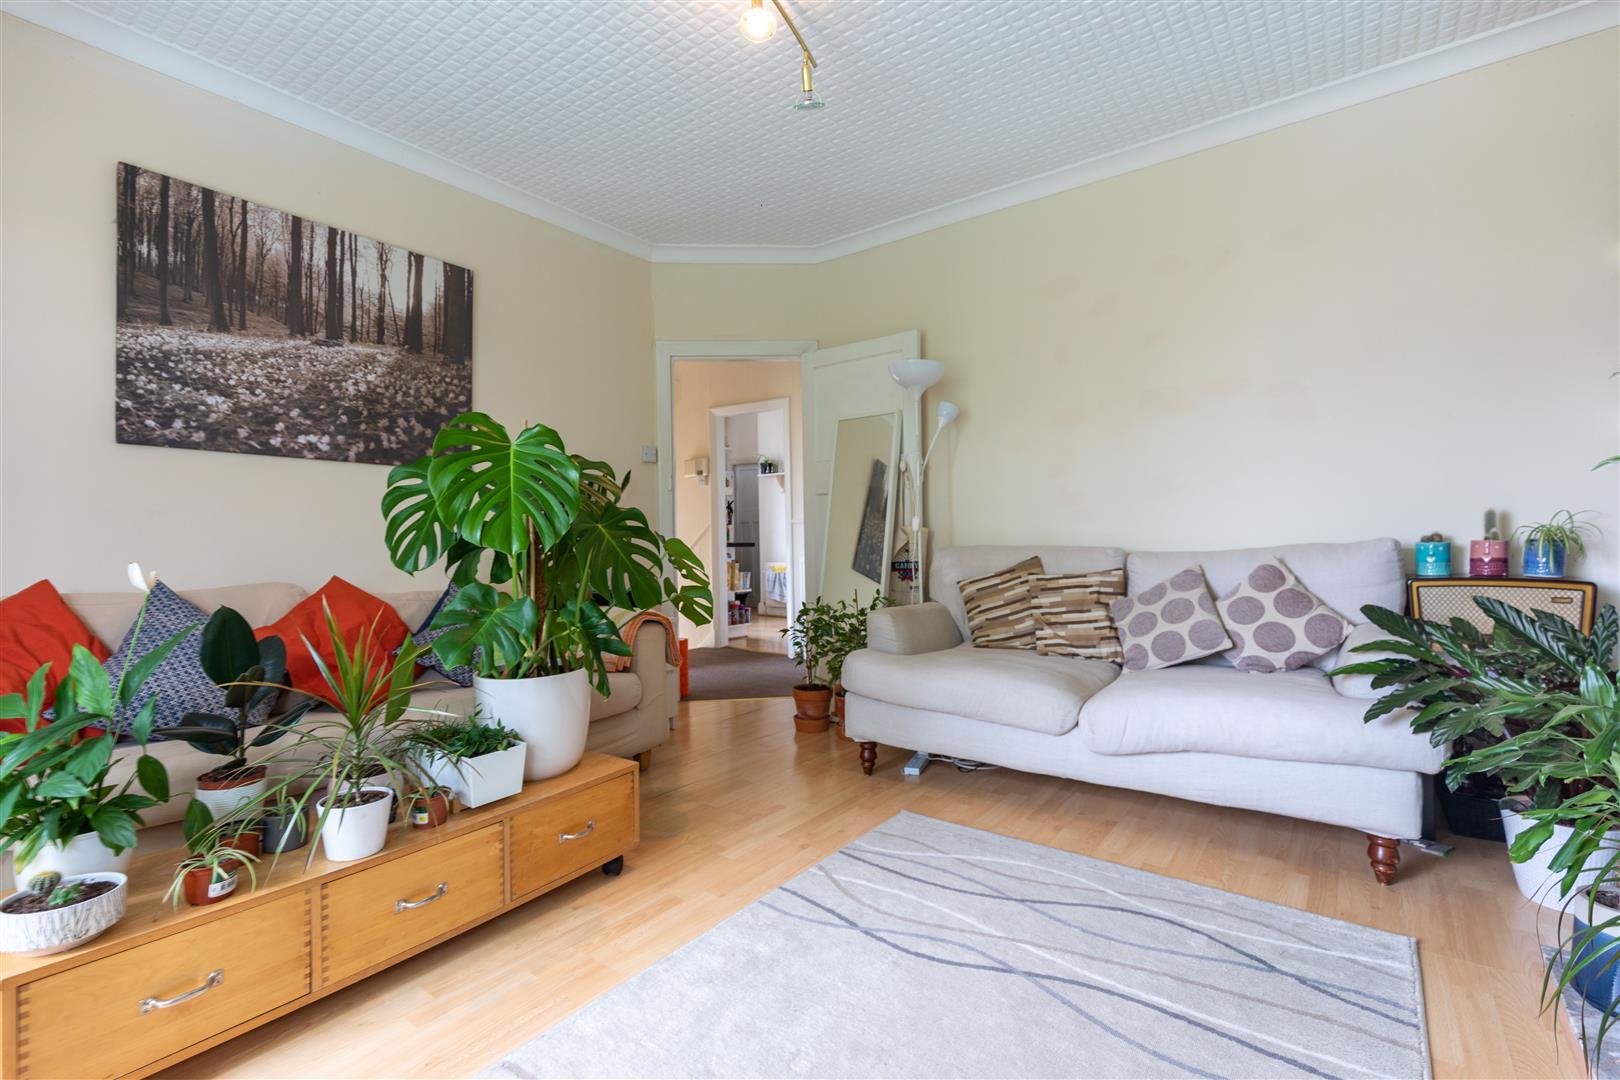 2 bed to rent in Fenham, NE5 2HX, NE5